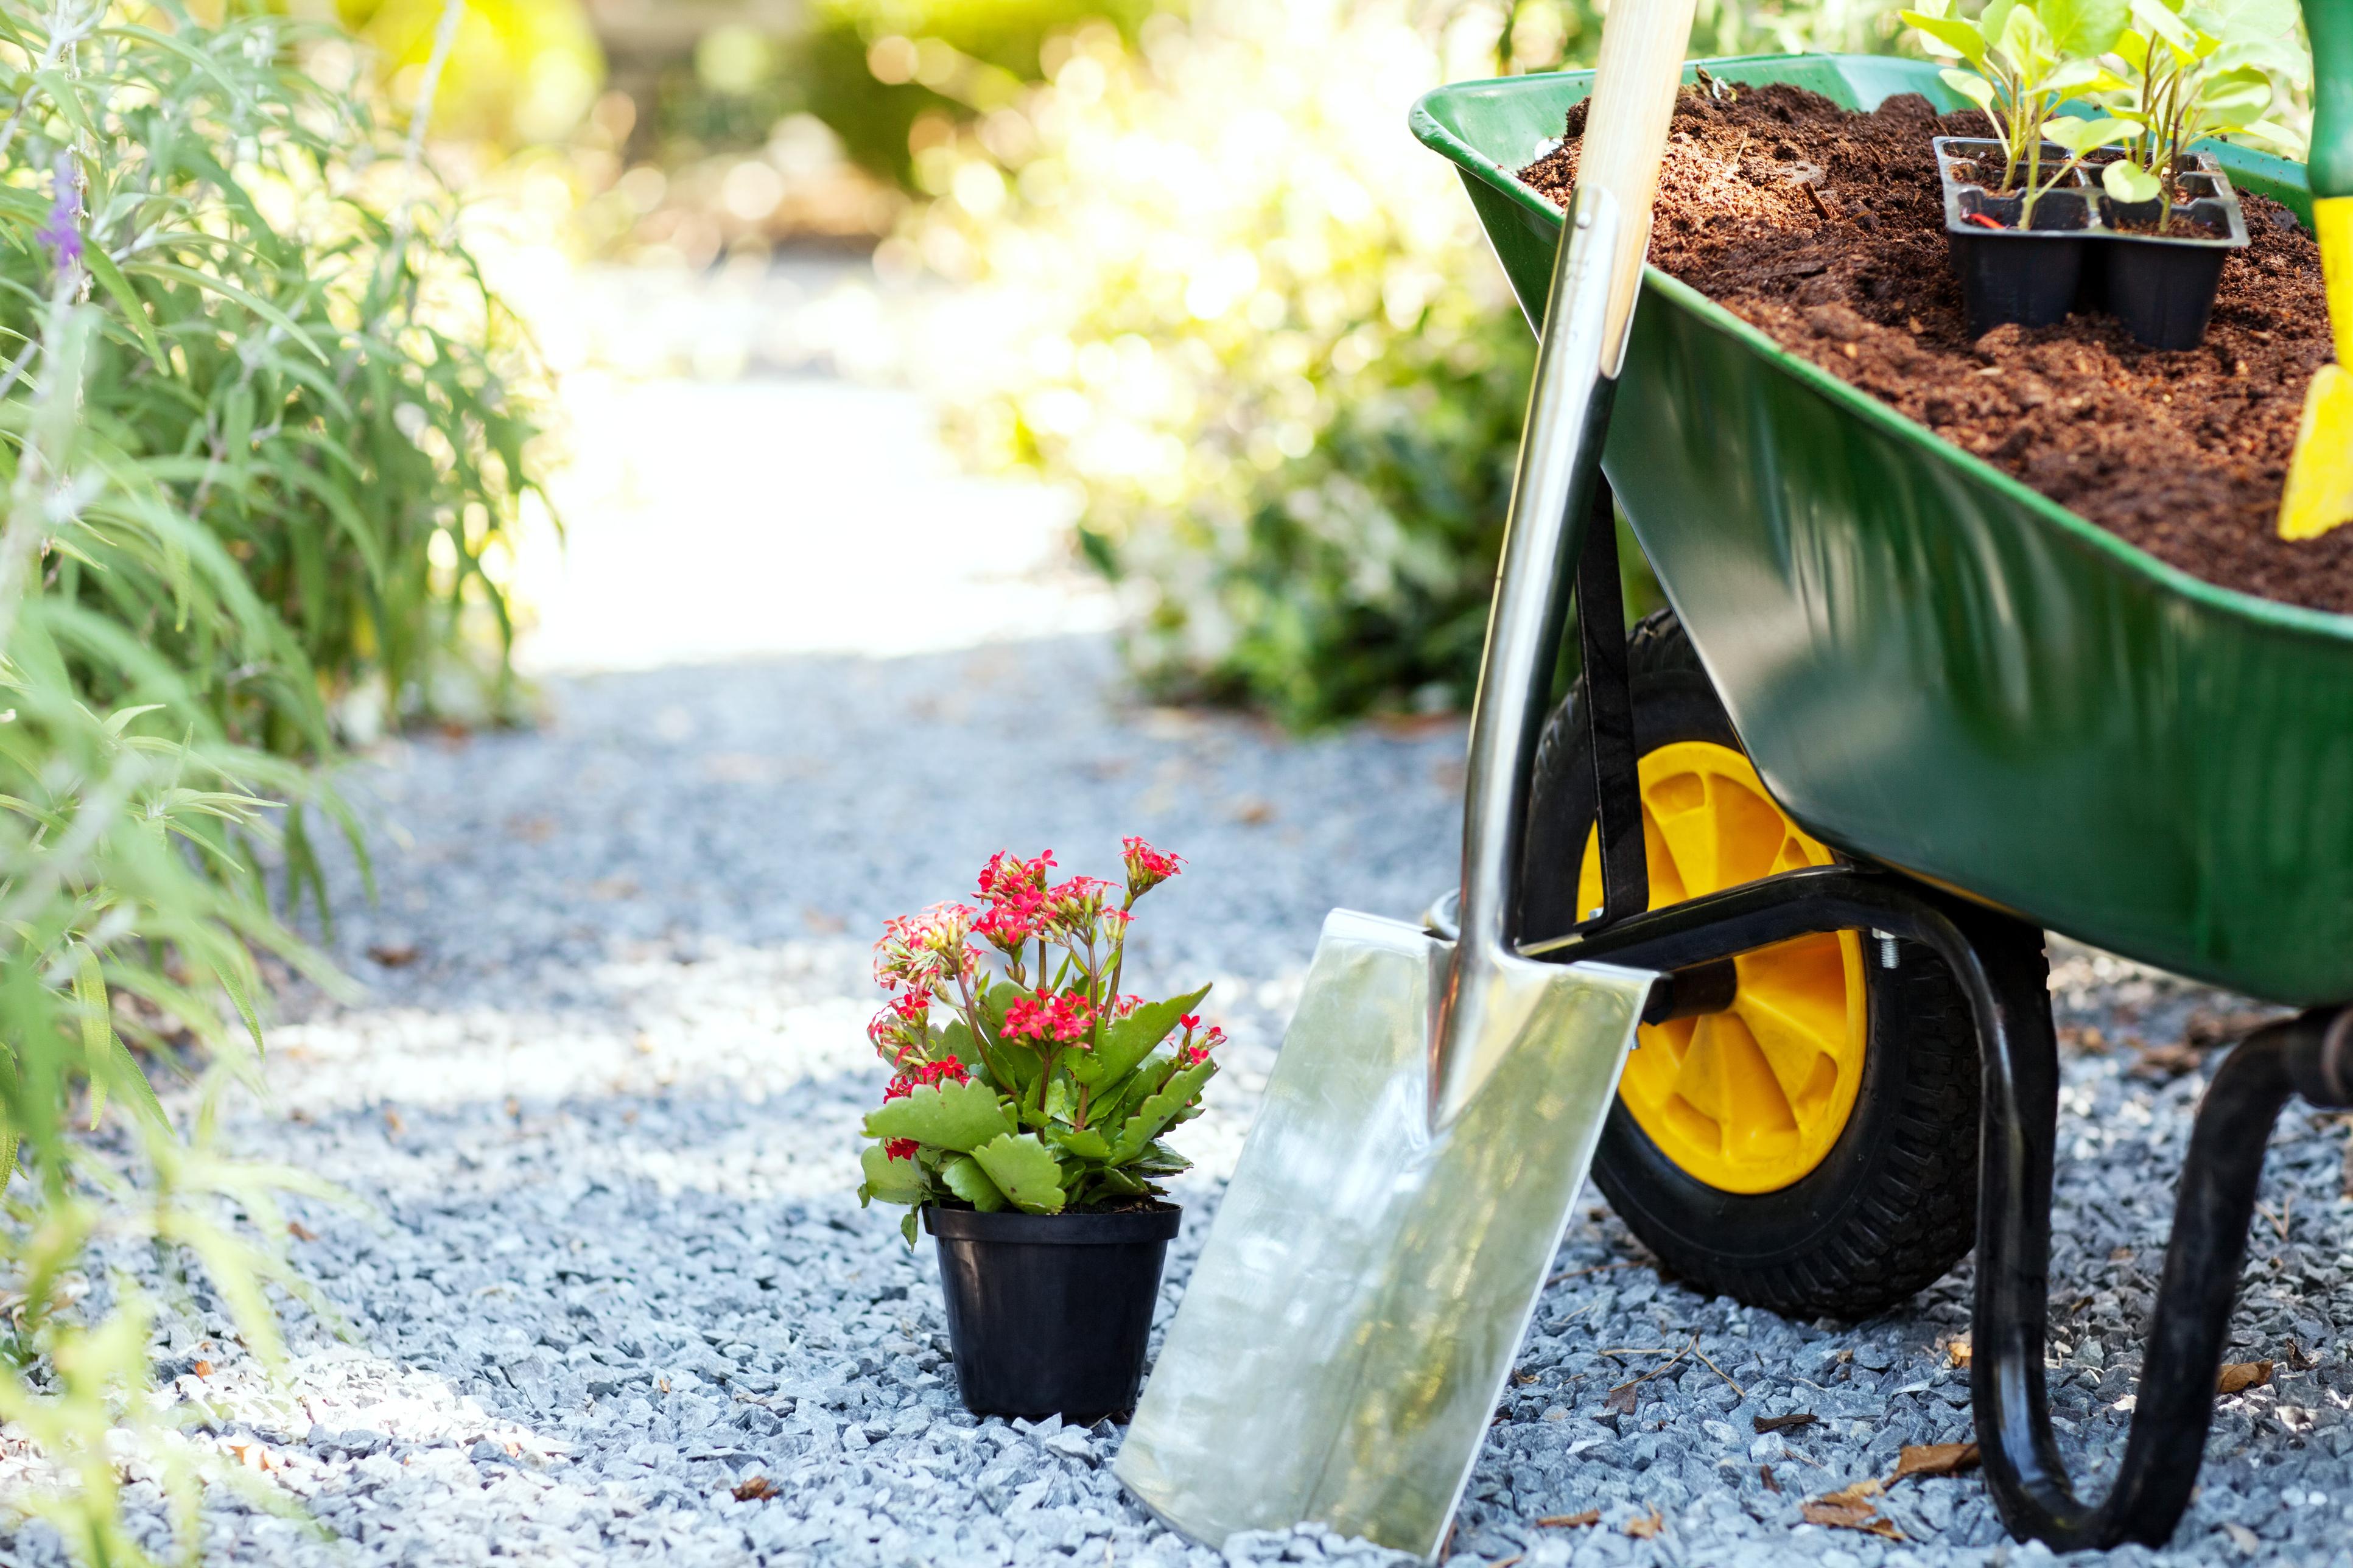 Wheelbarrow with shovel and flower pot in garden.